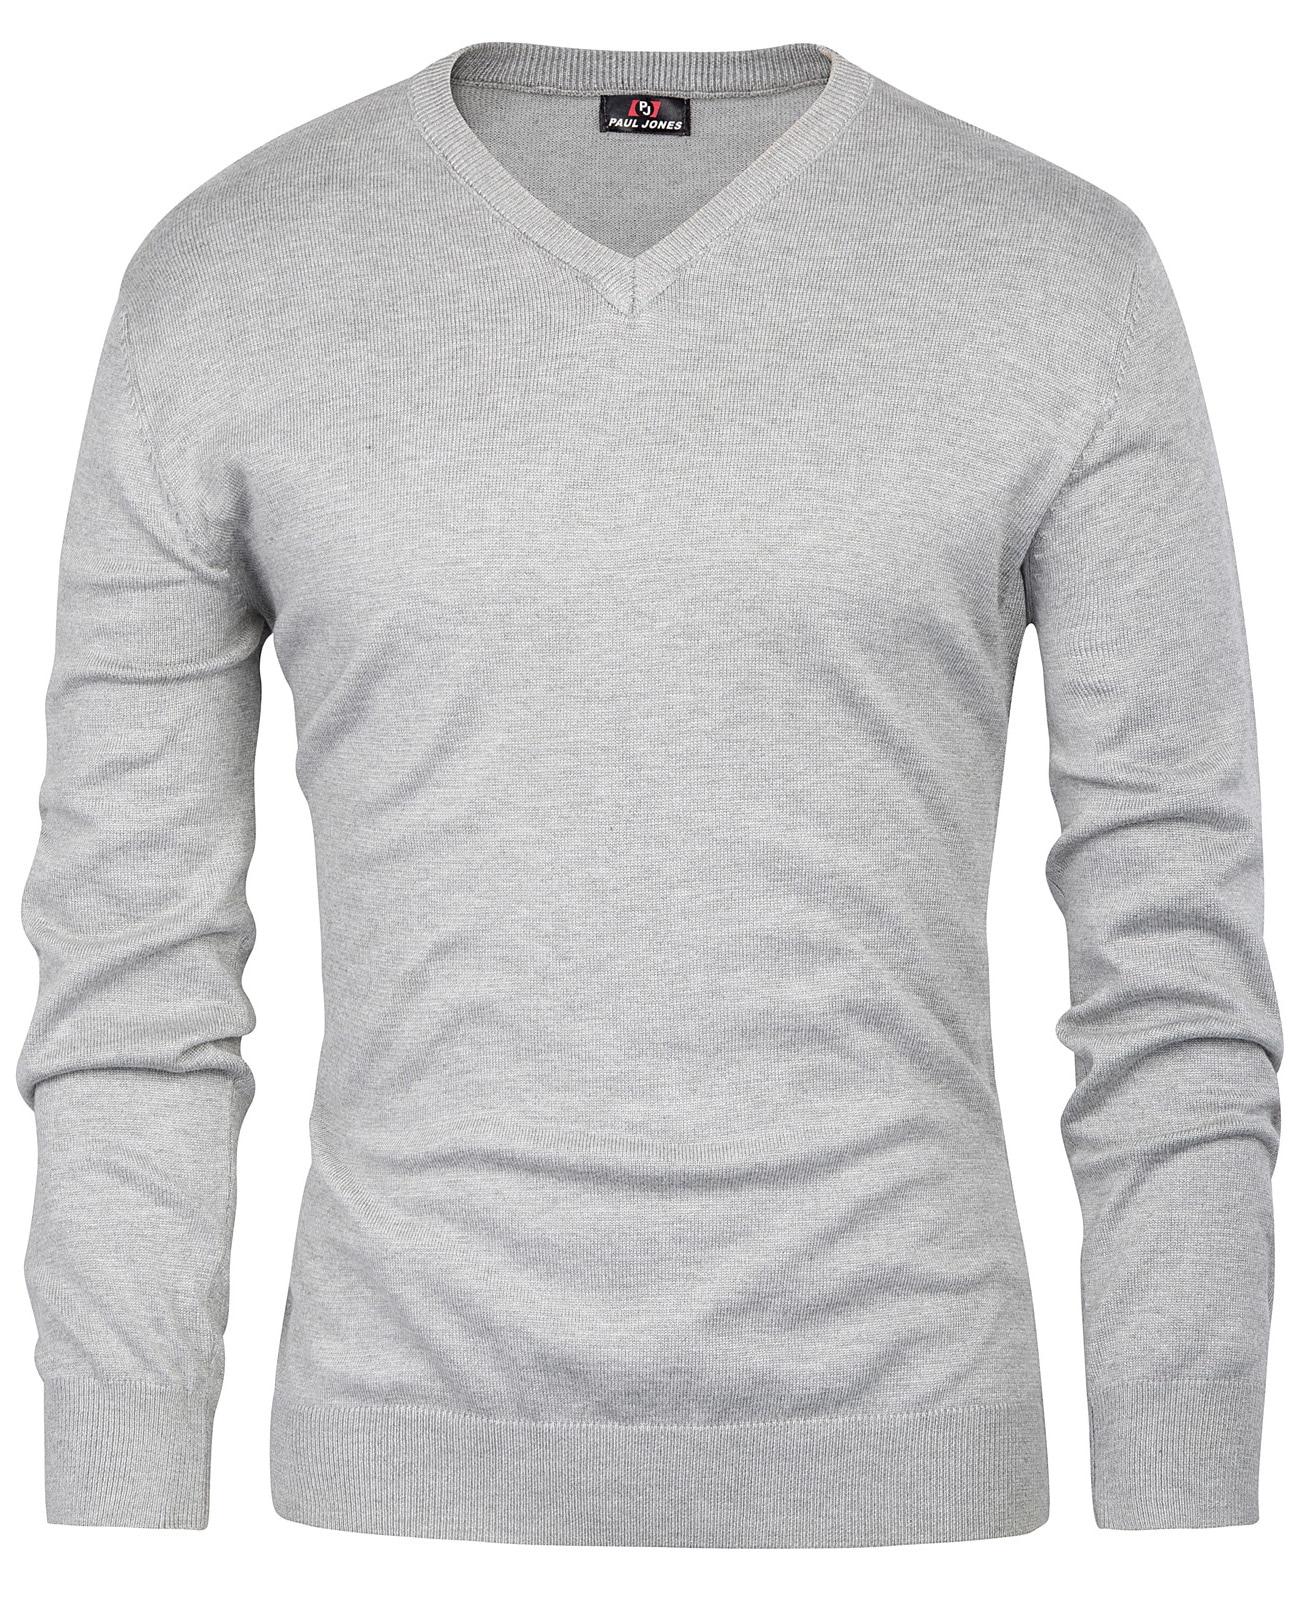 Pj Men\'s Stylish Long Sleeve V-neck Pullover Knitting Sweater Tops Handsome Wear